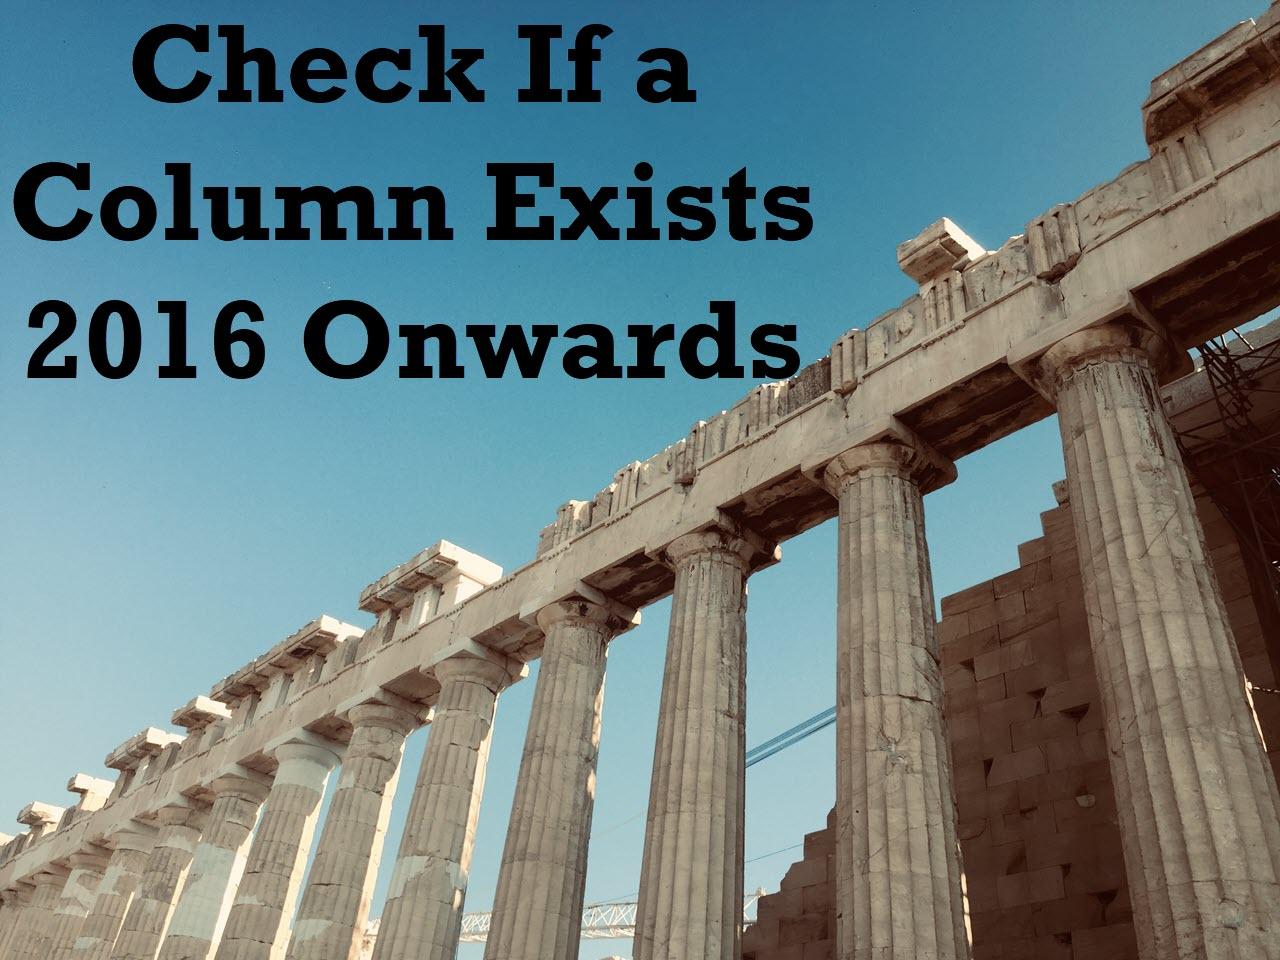 column exists